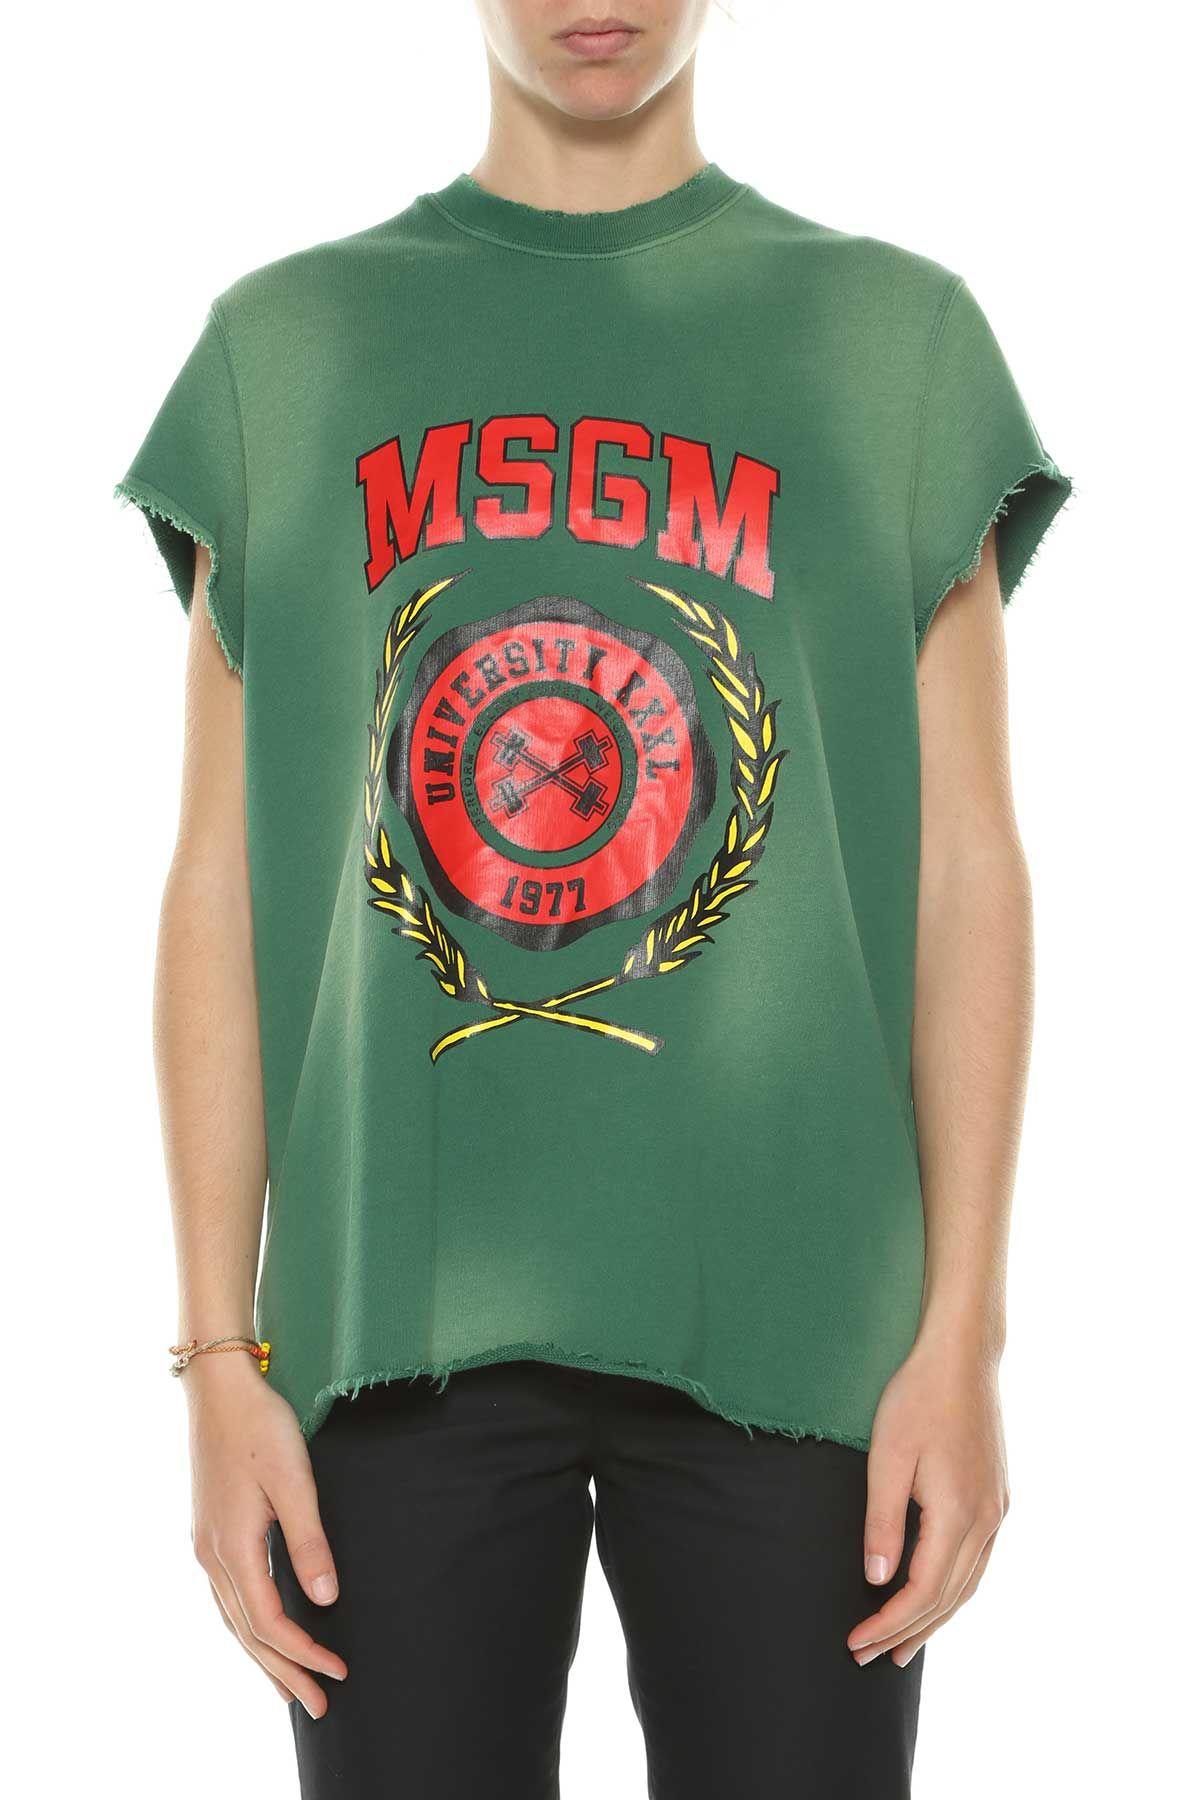 Msgm Short Sleeves Printed Sweatshirt